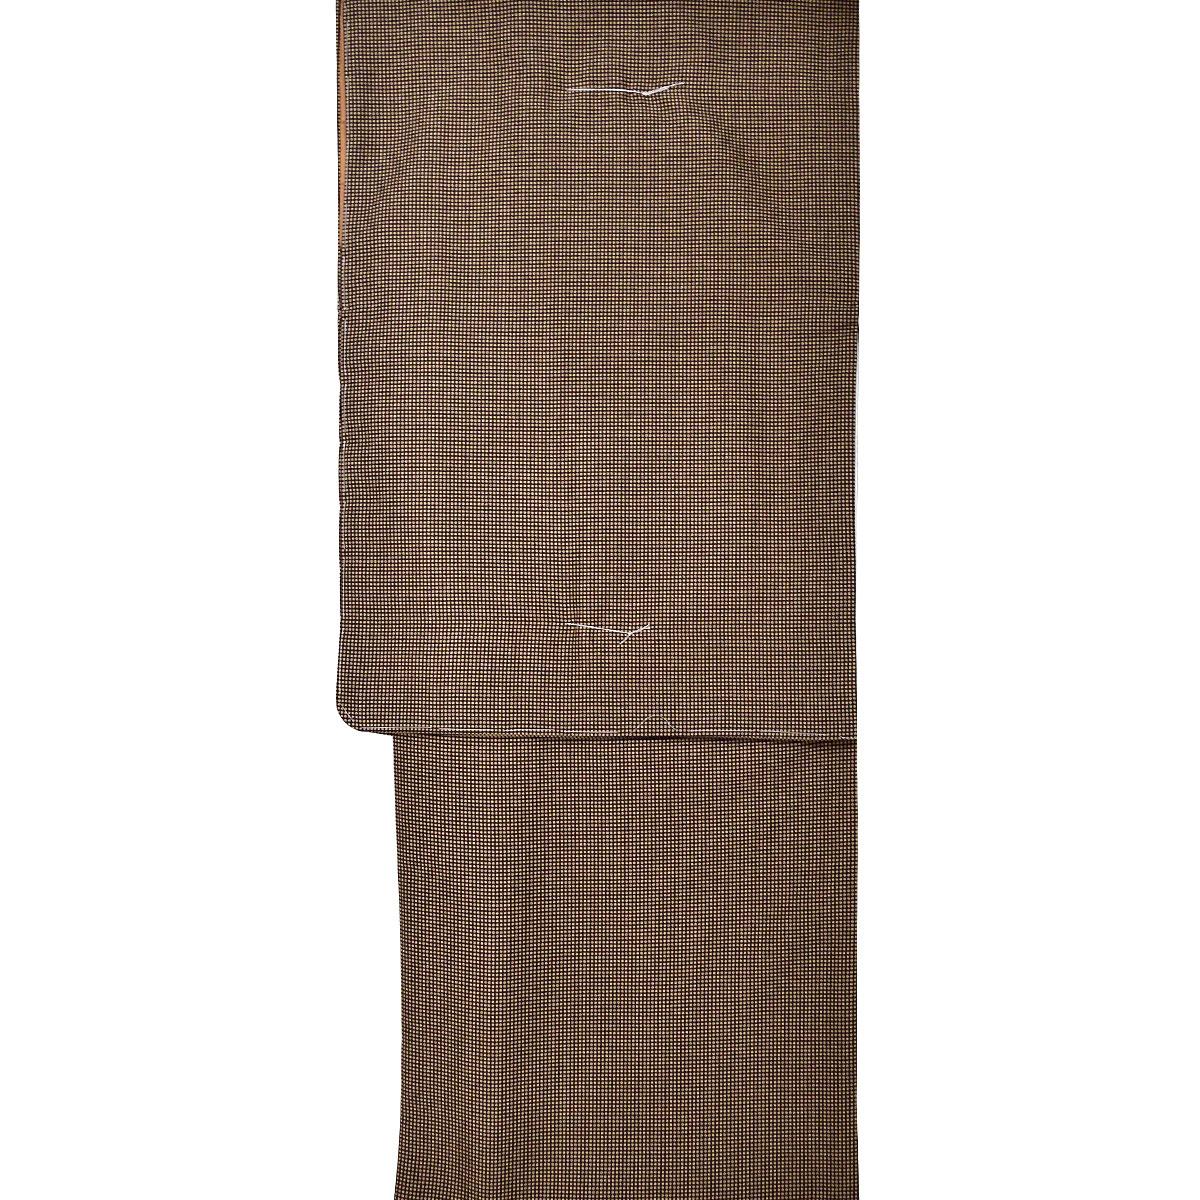 【M寸】 洗える着物 【 袷 】【 江戸小紋 】 【 仕立て上がり 】 洗える 着物 単品商品番号d914-57